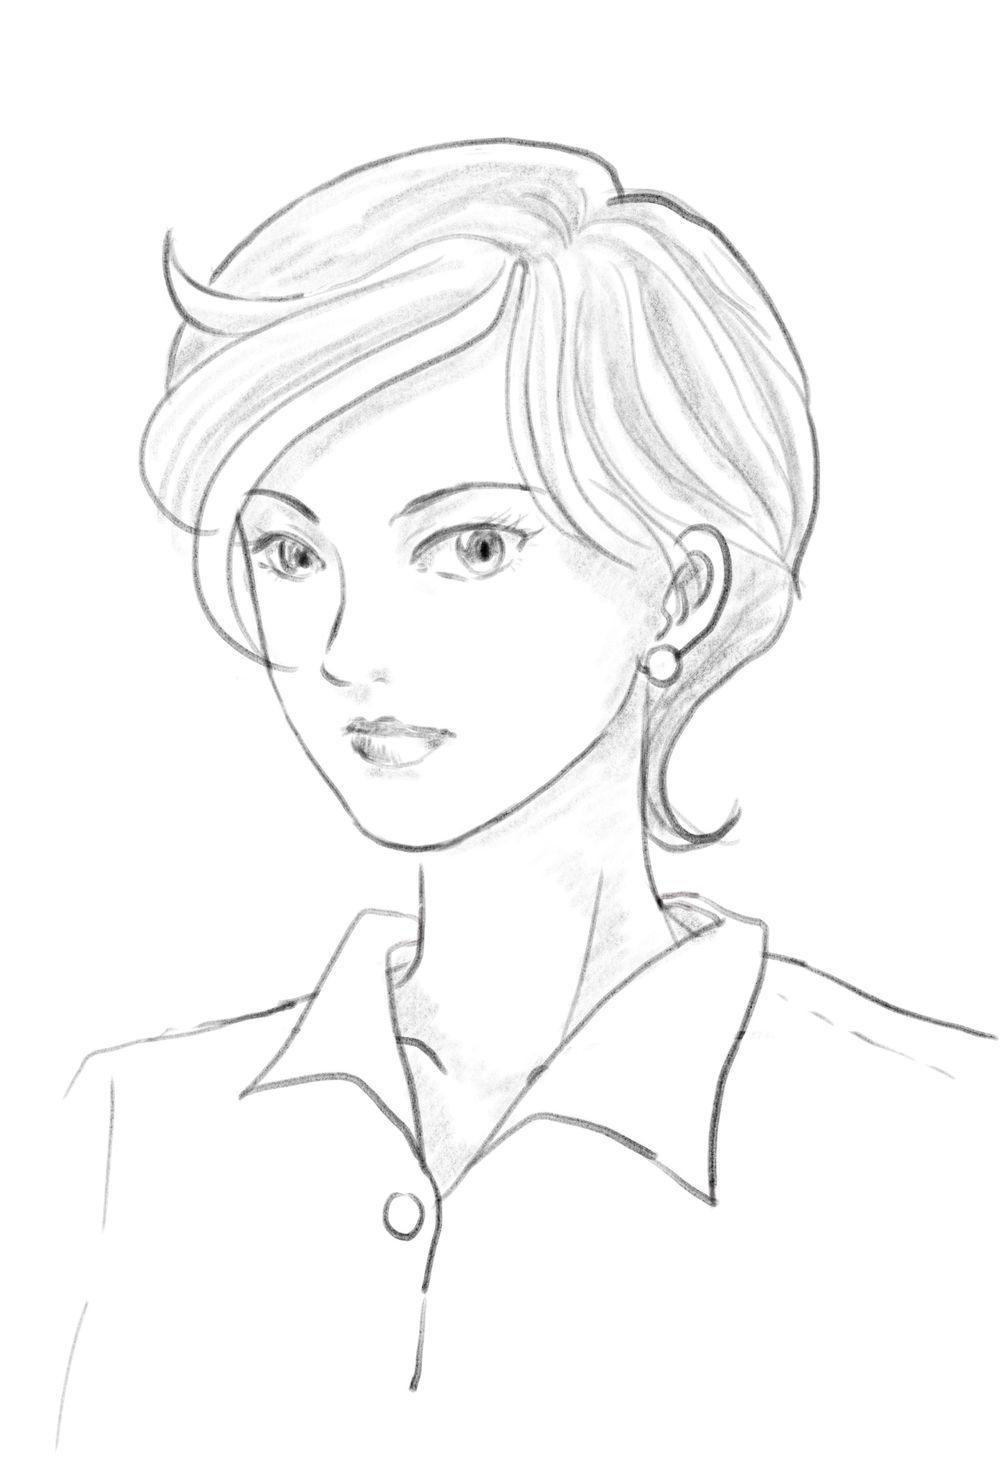 Procreate female portrait - image 1 - student project